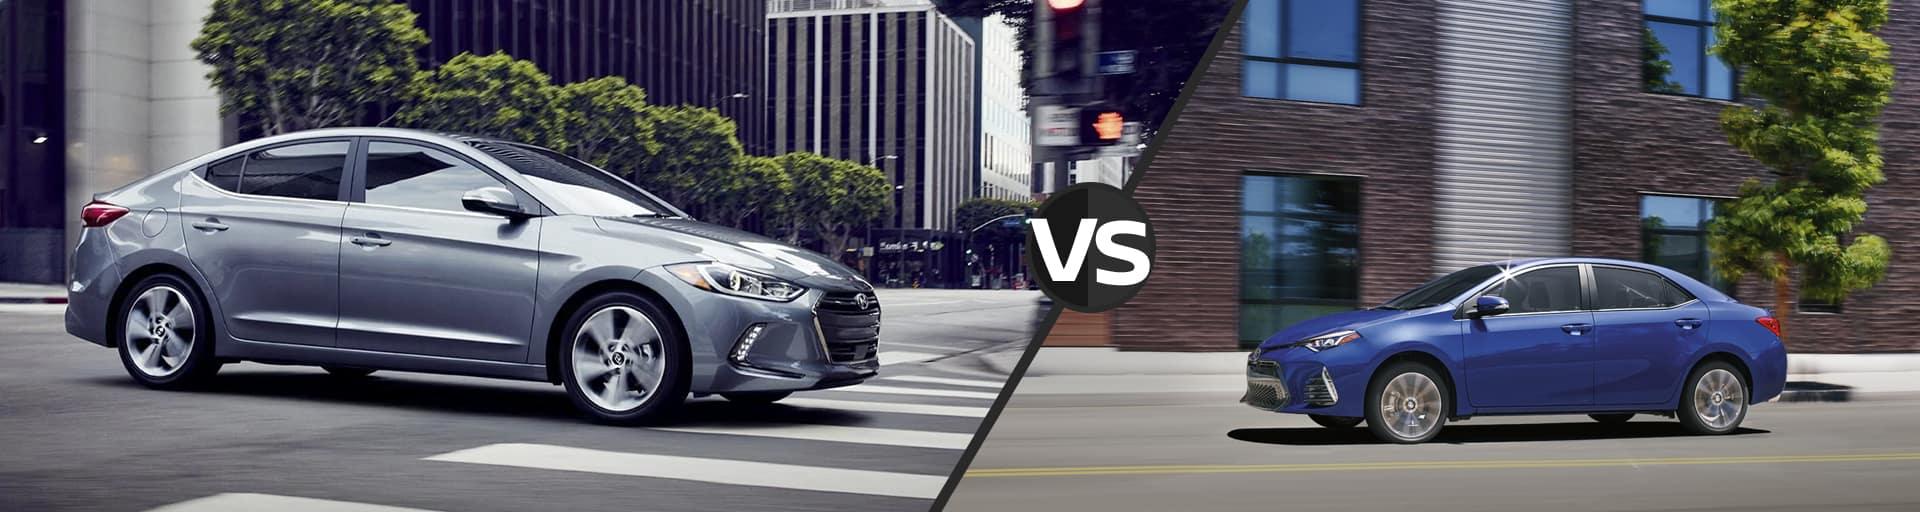 2018 Hyundai Elantra Vs. 2018 Toyota Corolla | Murfreesboro TN | Serving  Franklin U0026 Nashville